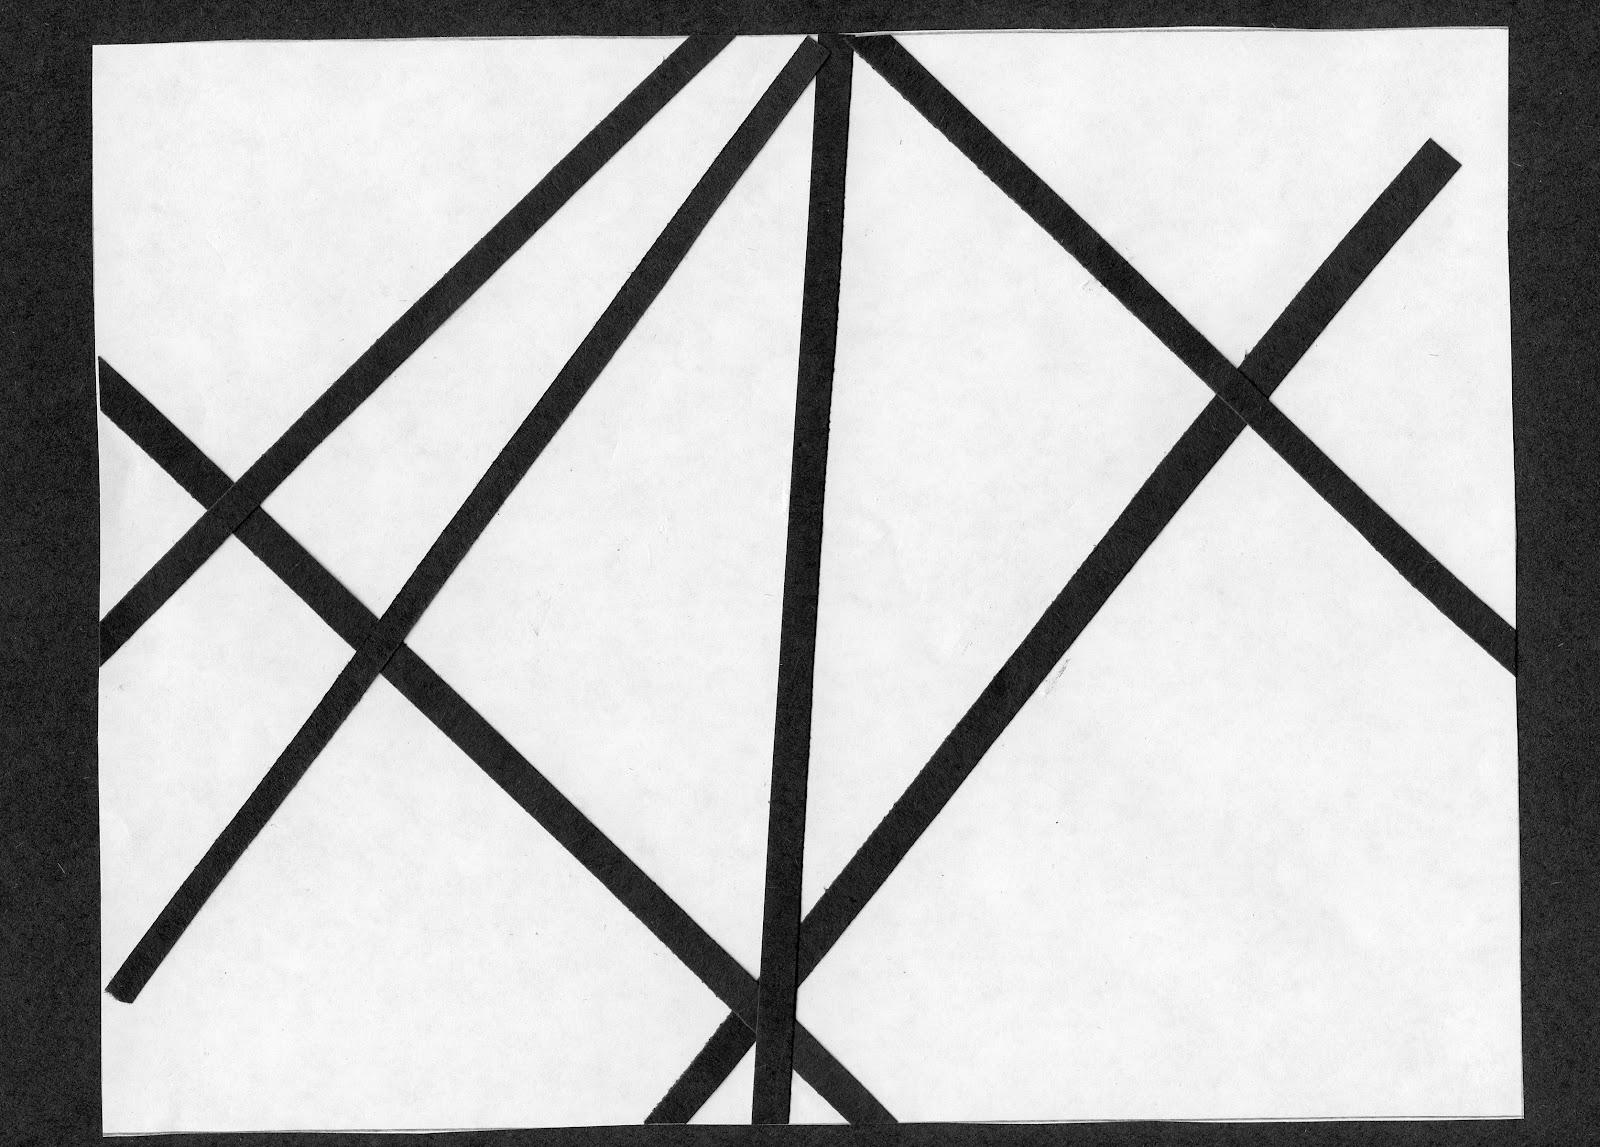 Line Composition Design : Finished compositions amber s d design